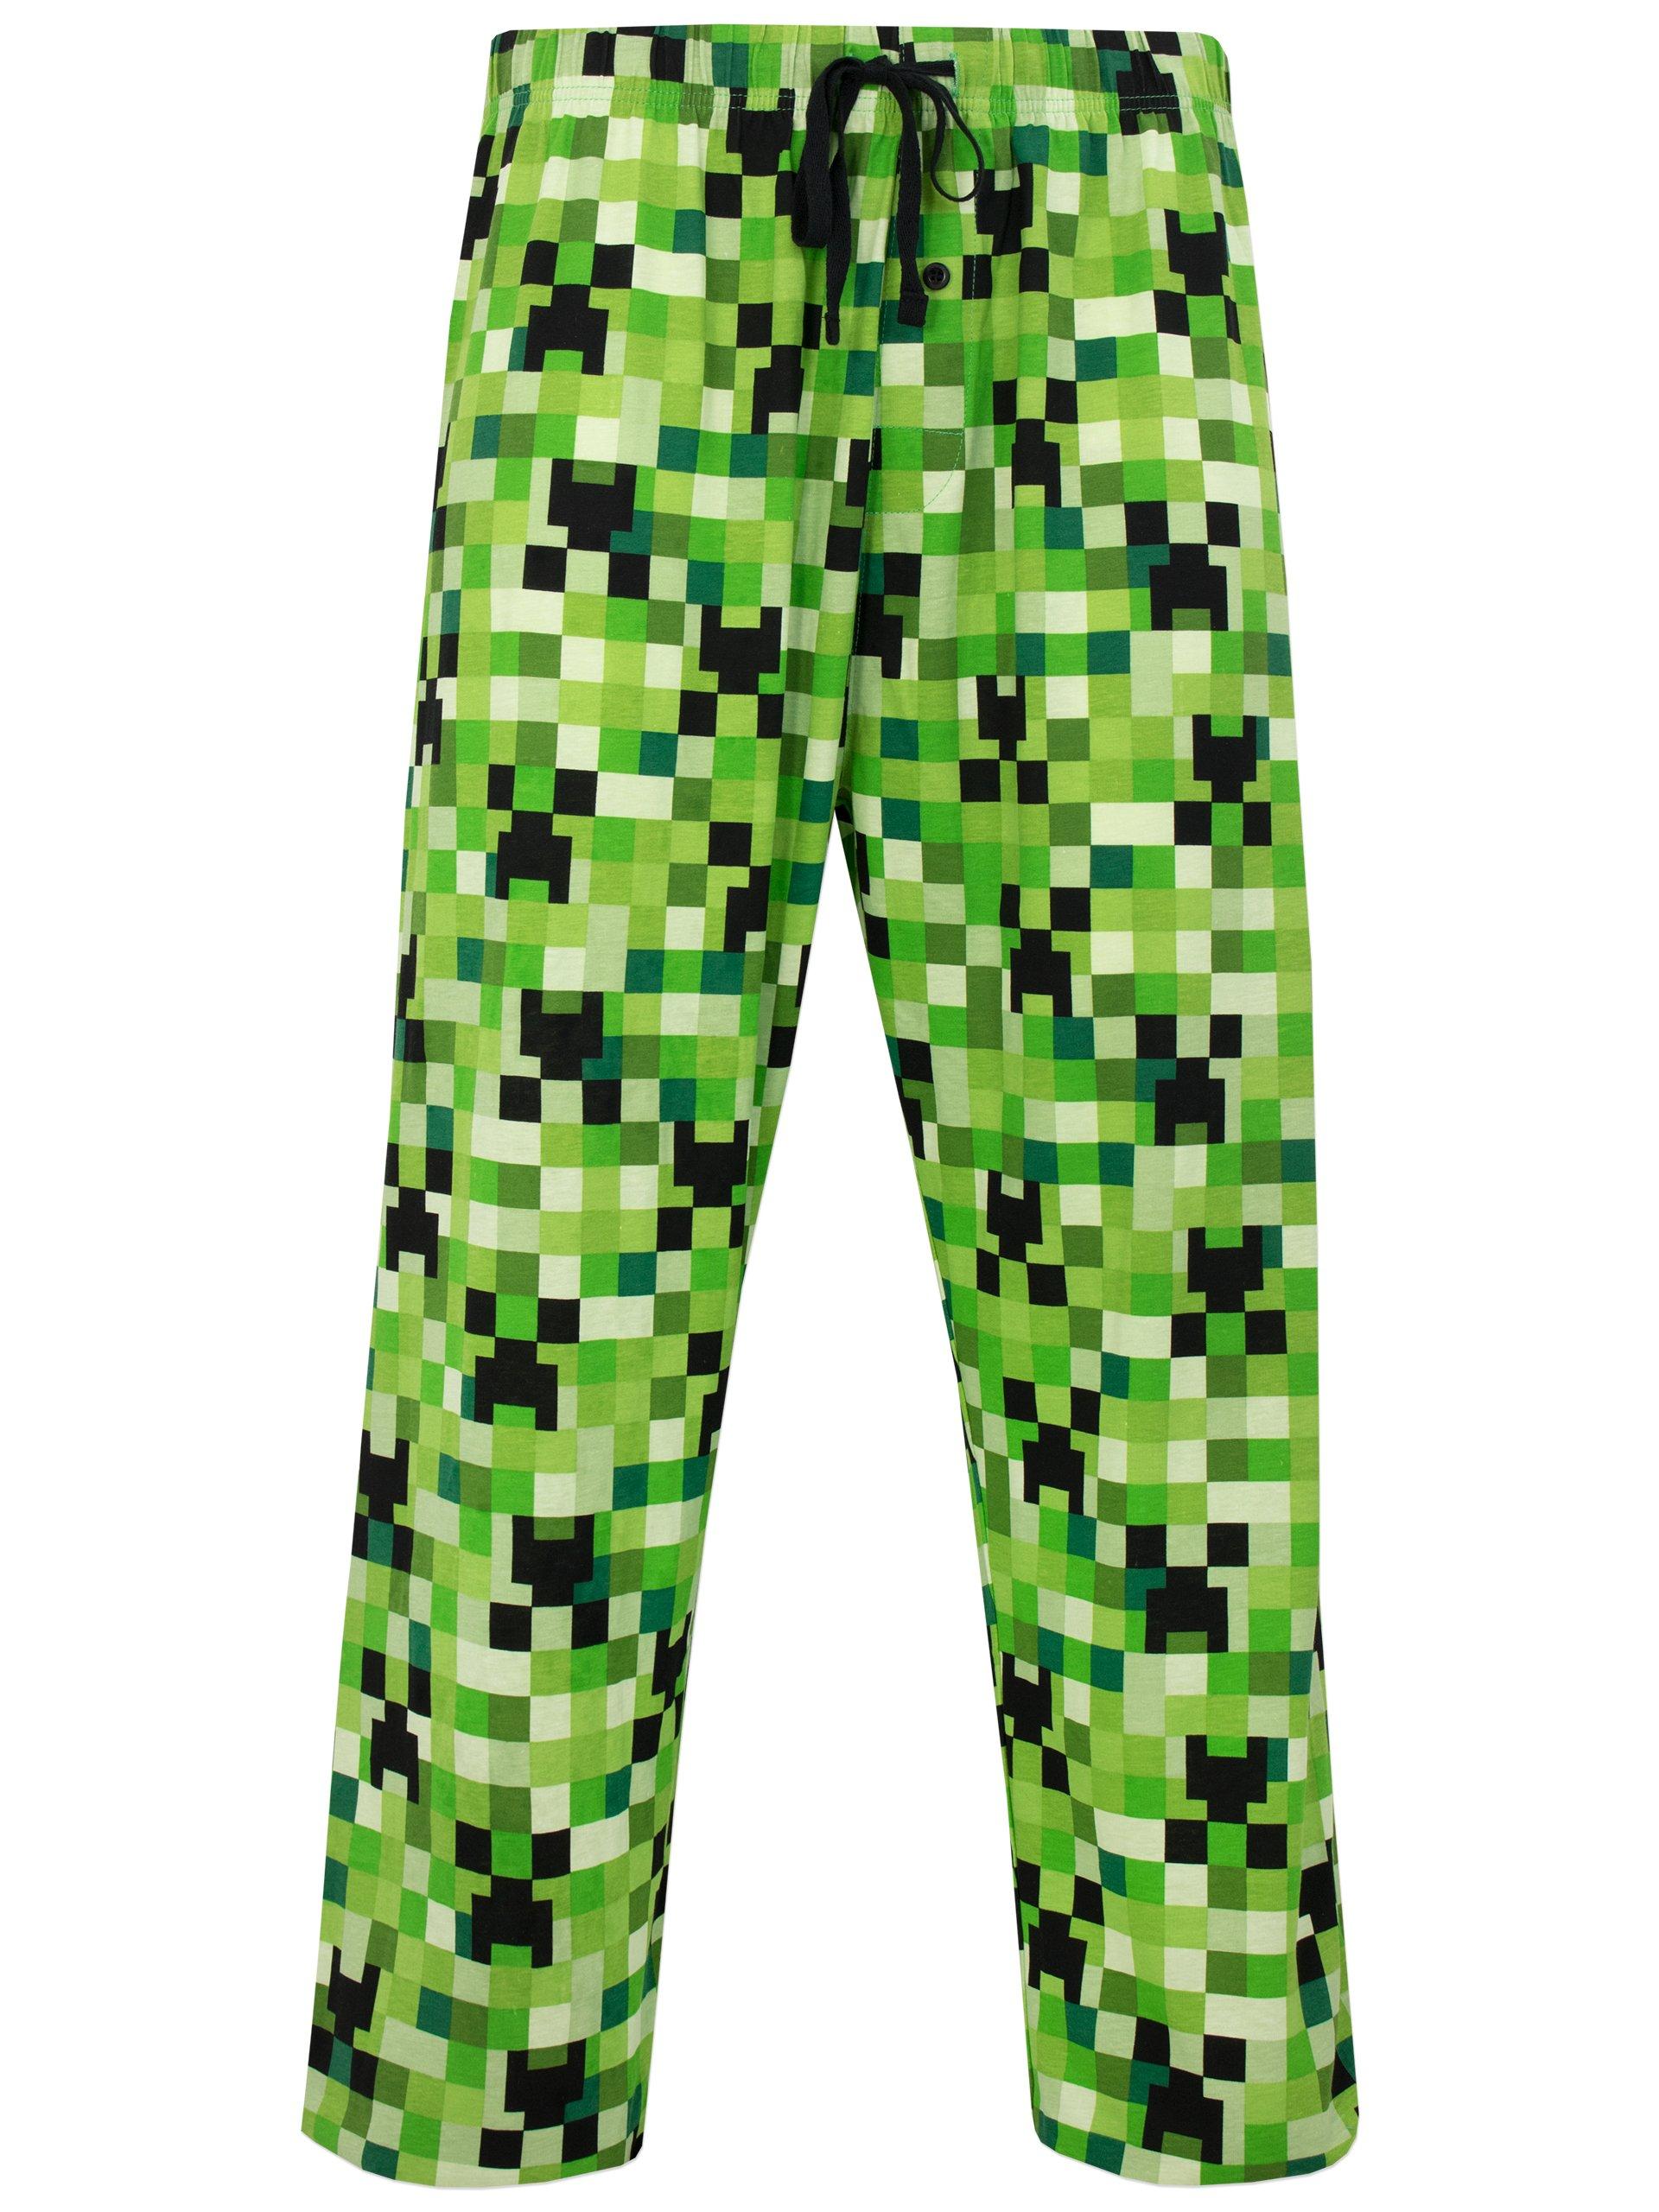 Minecraft Mens Lounge Pant Size XX-Large